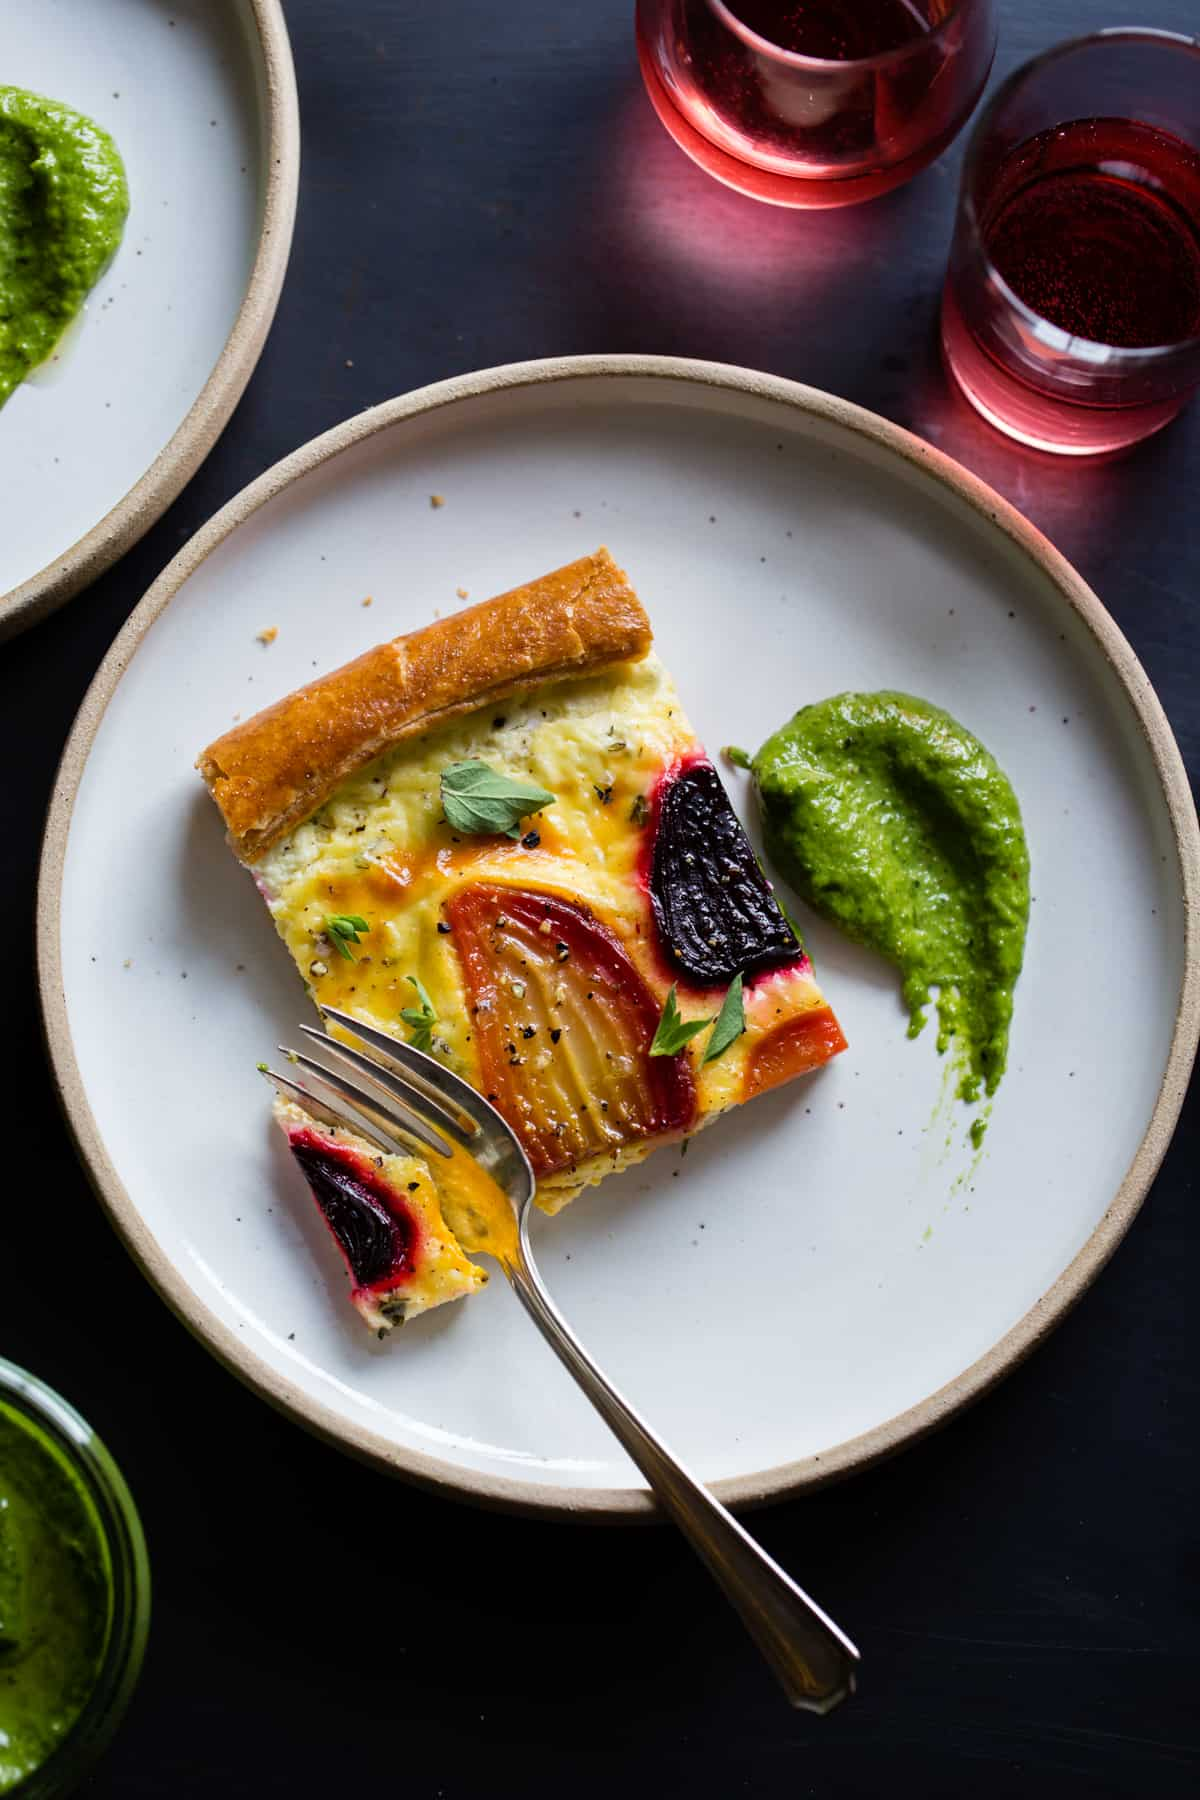 fork cutting into Ricotta Beet Tart with Beet Green Pesto